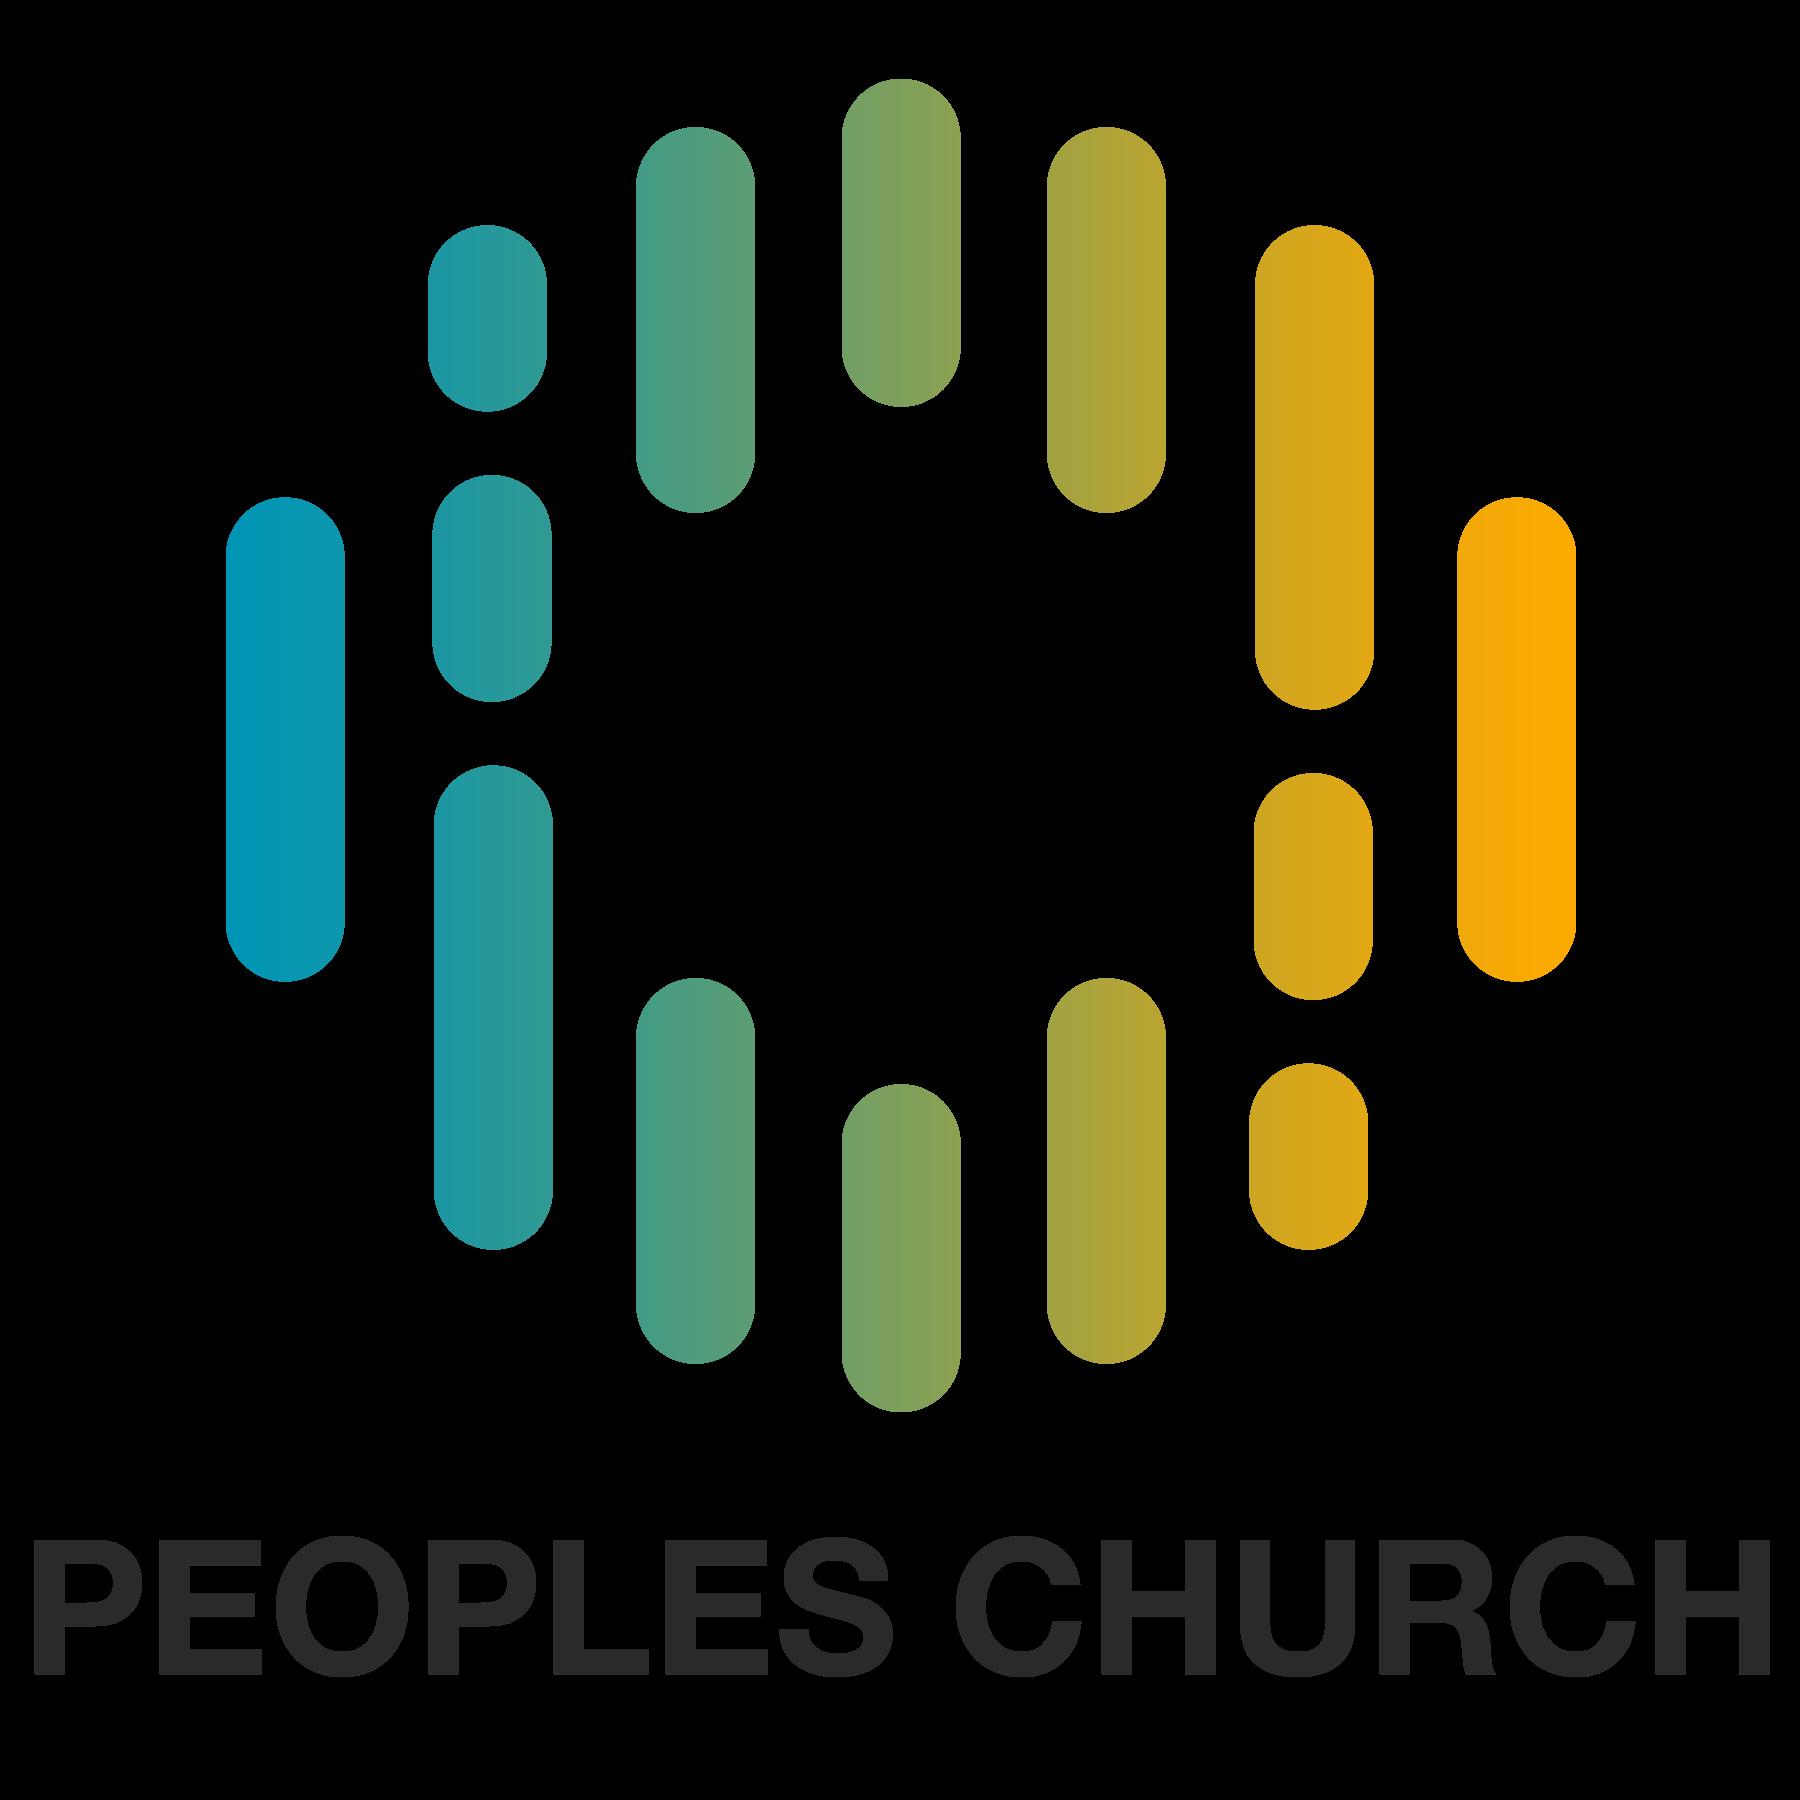 Peoples Church STL